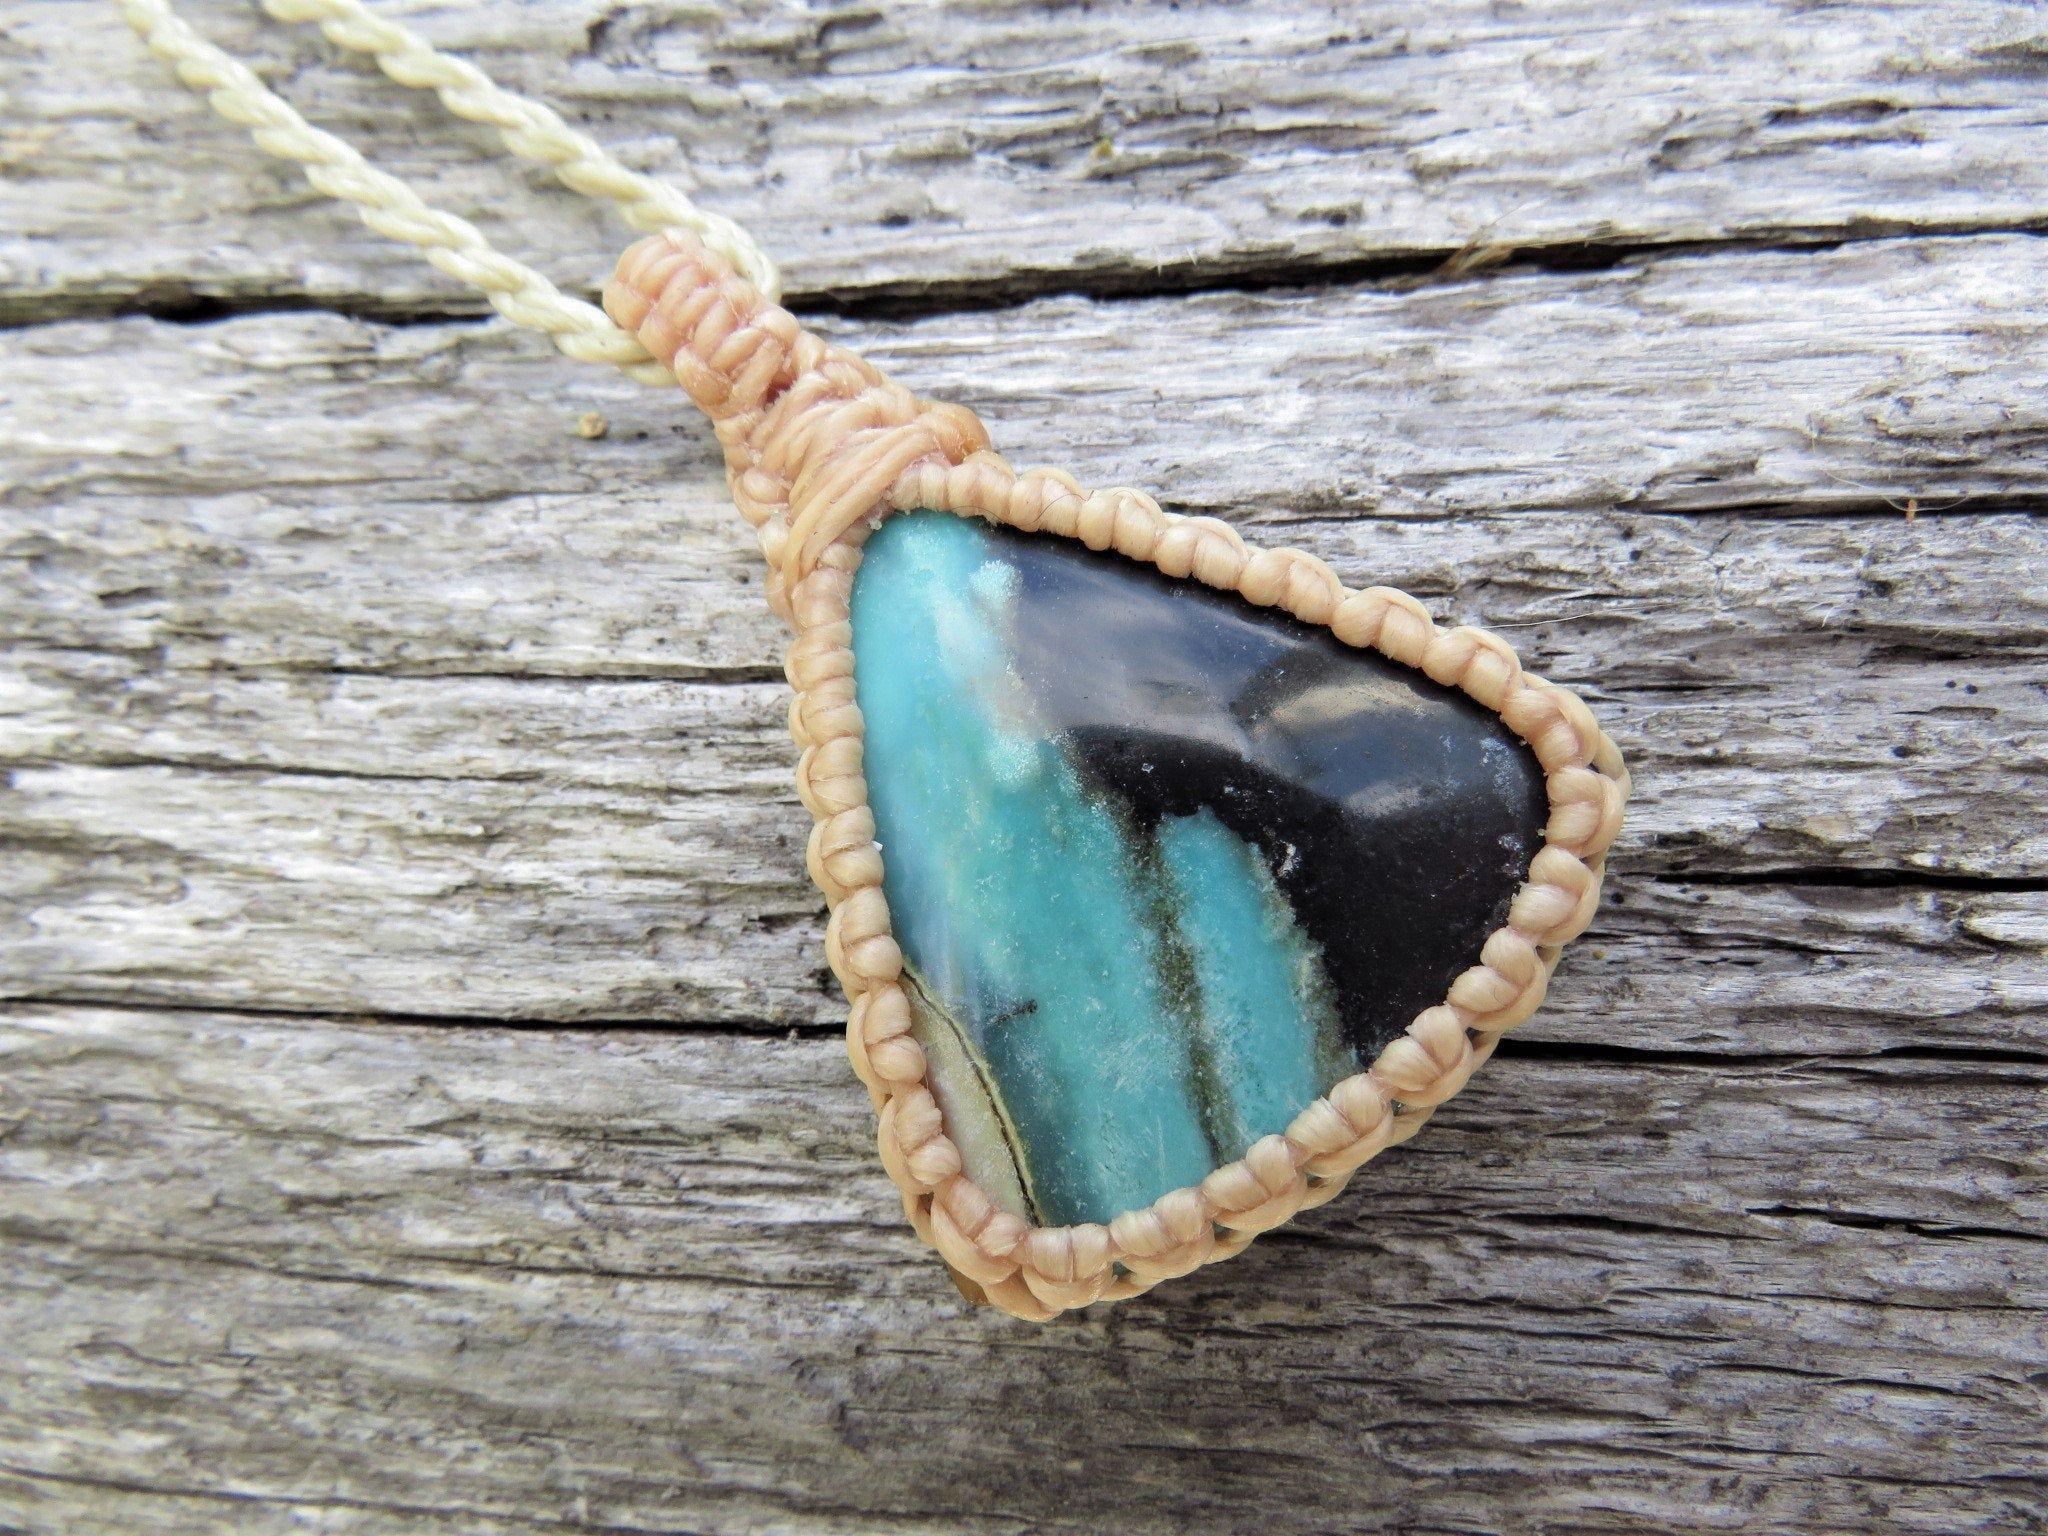 Blue Opalized Wood Macrame Necklace